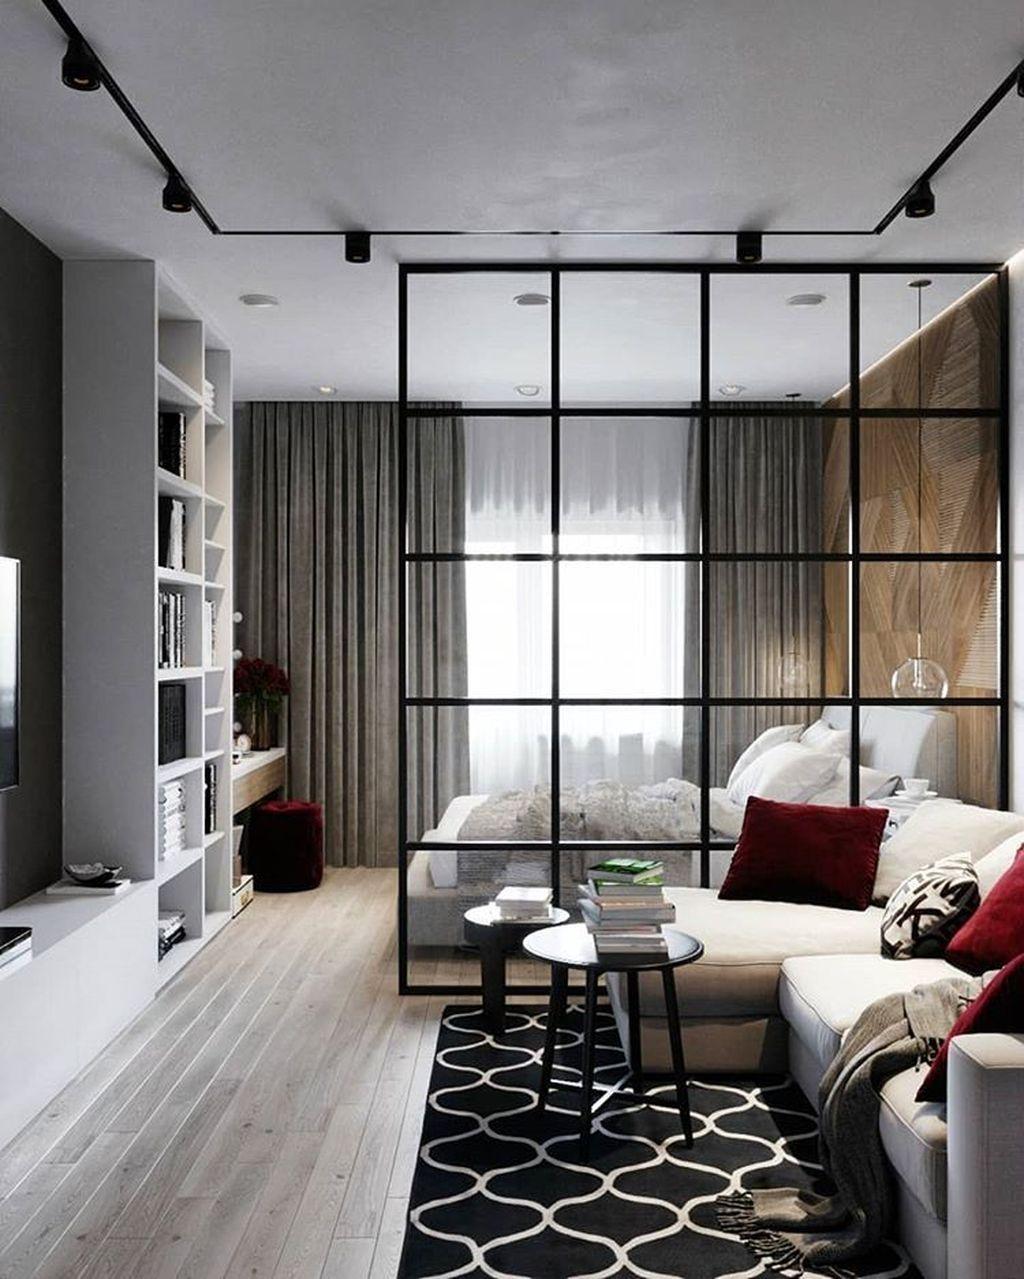 20 Fabulous Studio Apartment Decor Ideas On A Budget Small